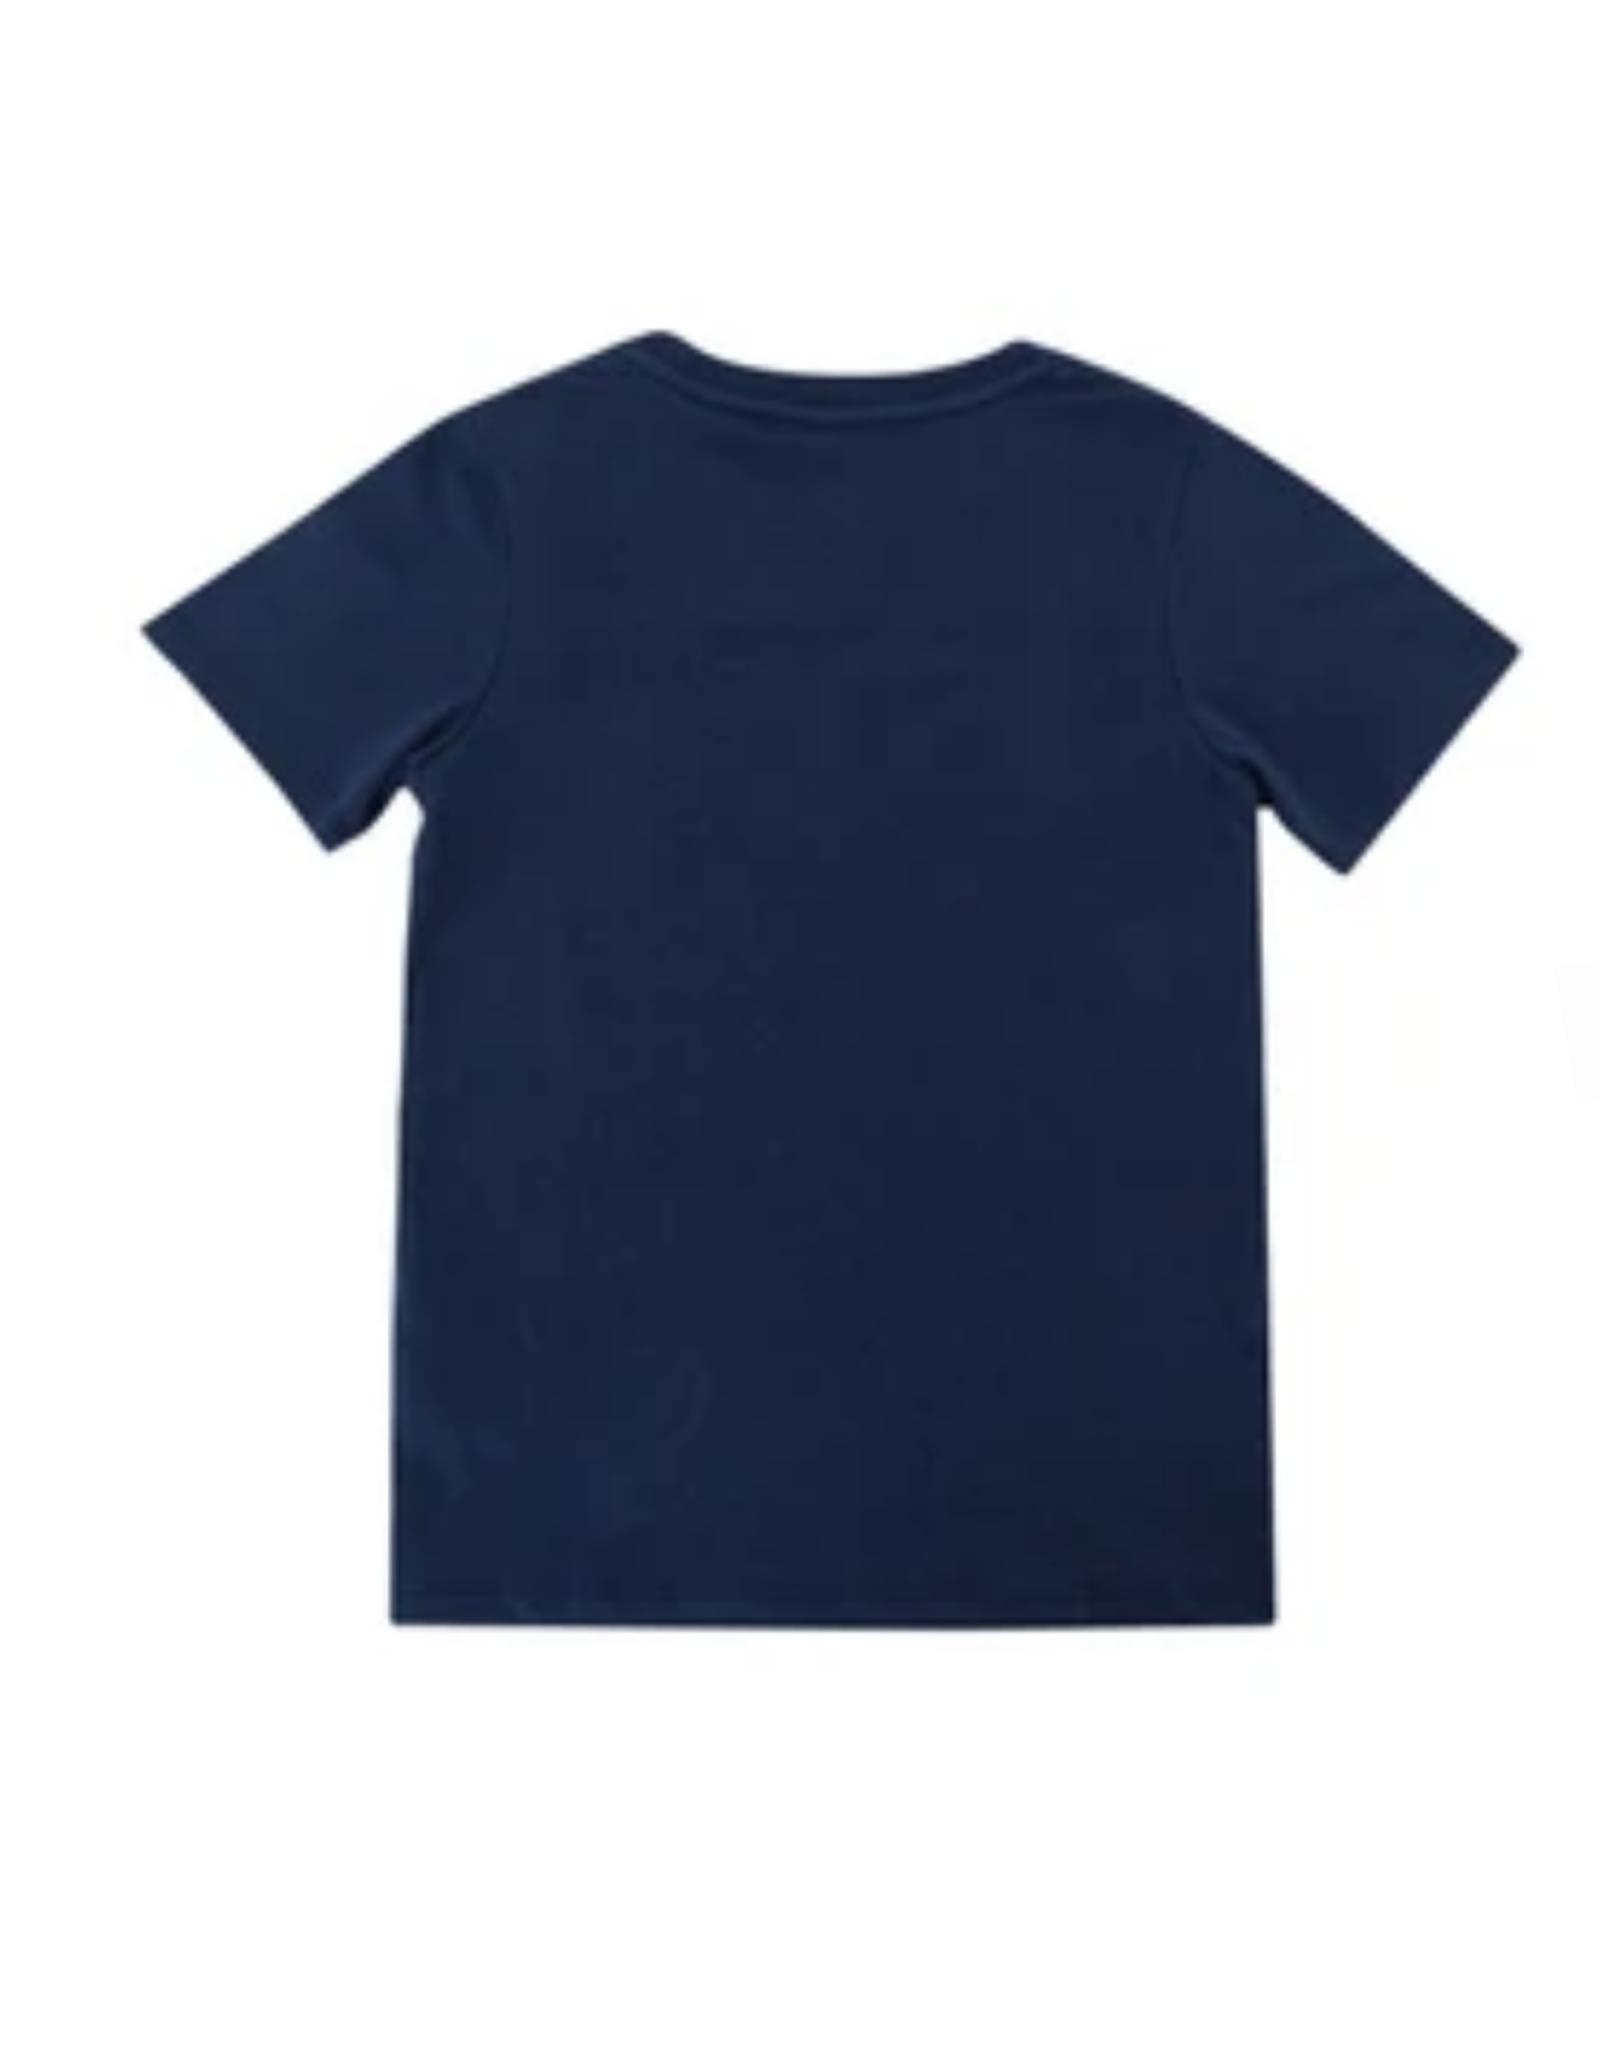 MLB Child Baby Mascot T-Shirt Boston Red Sox